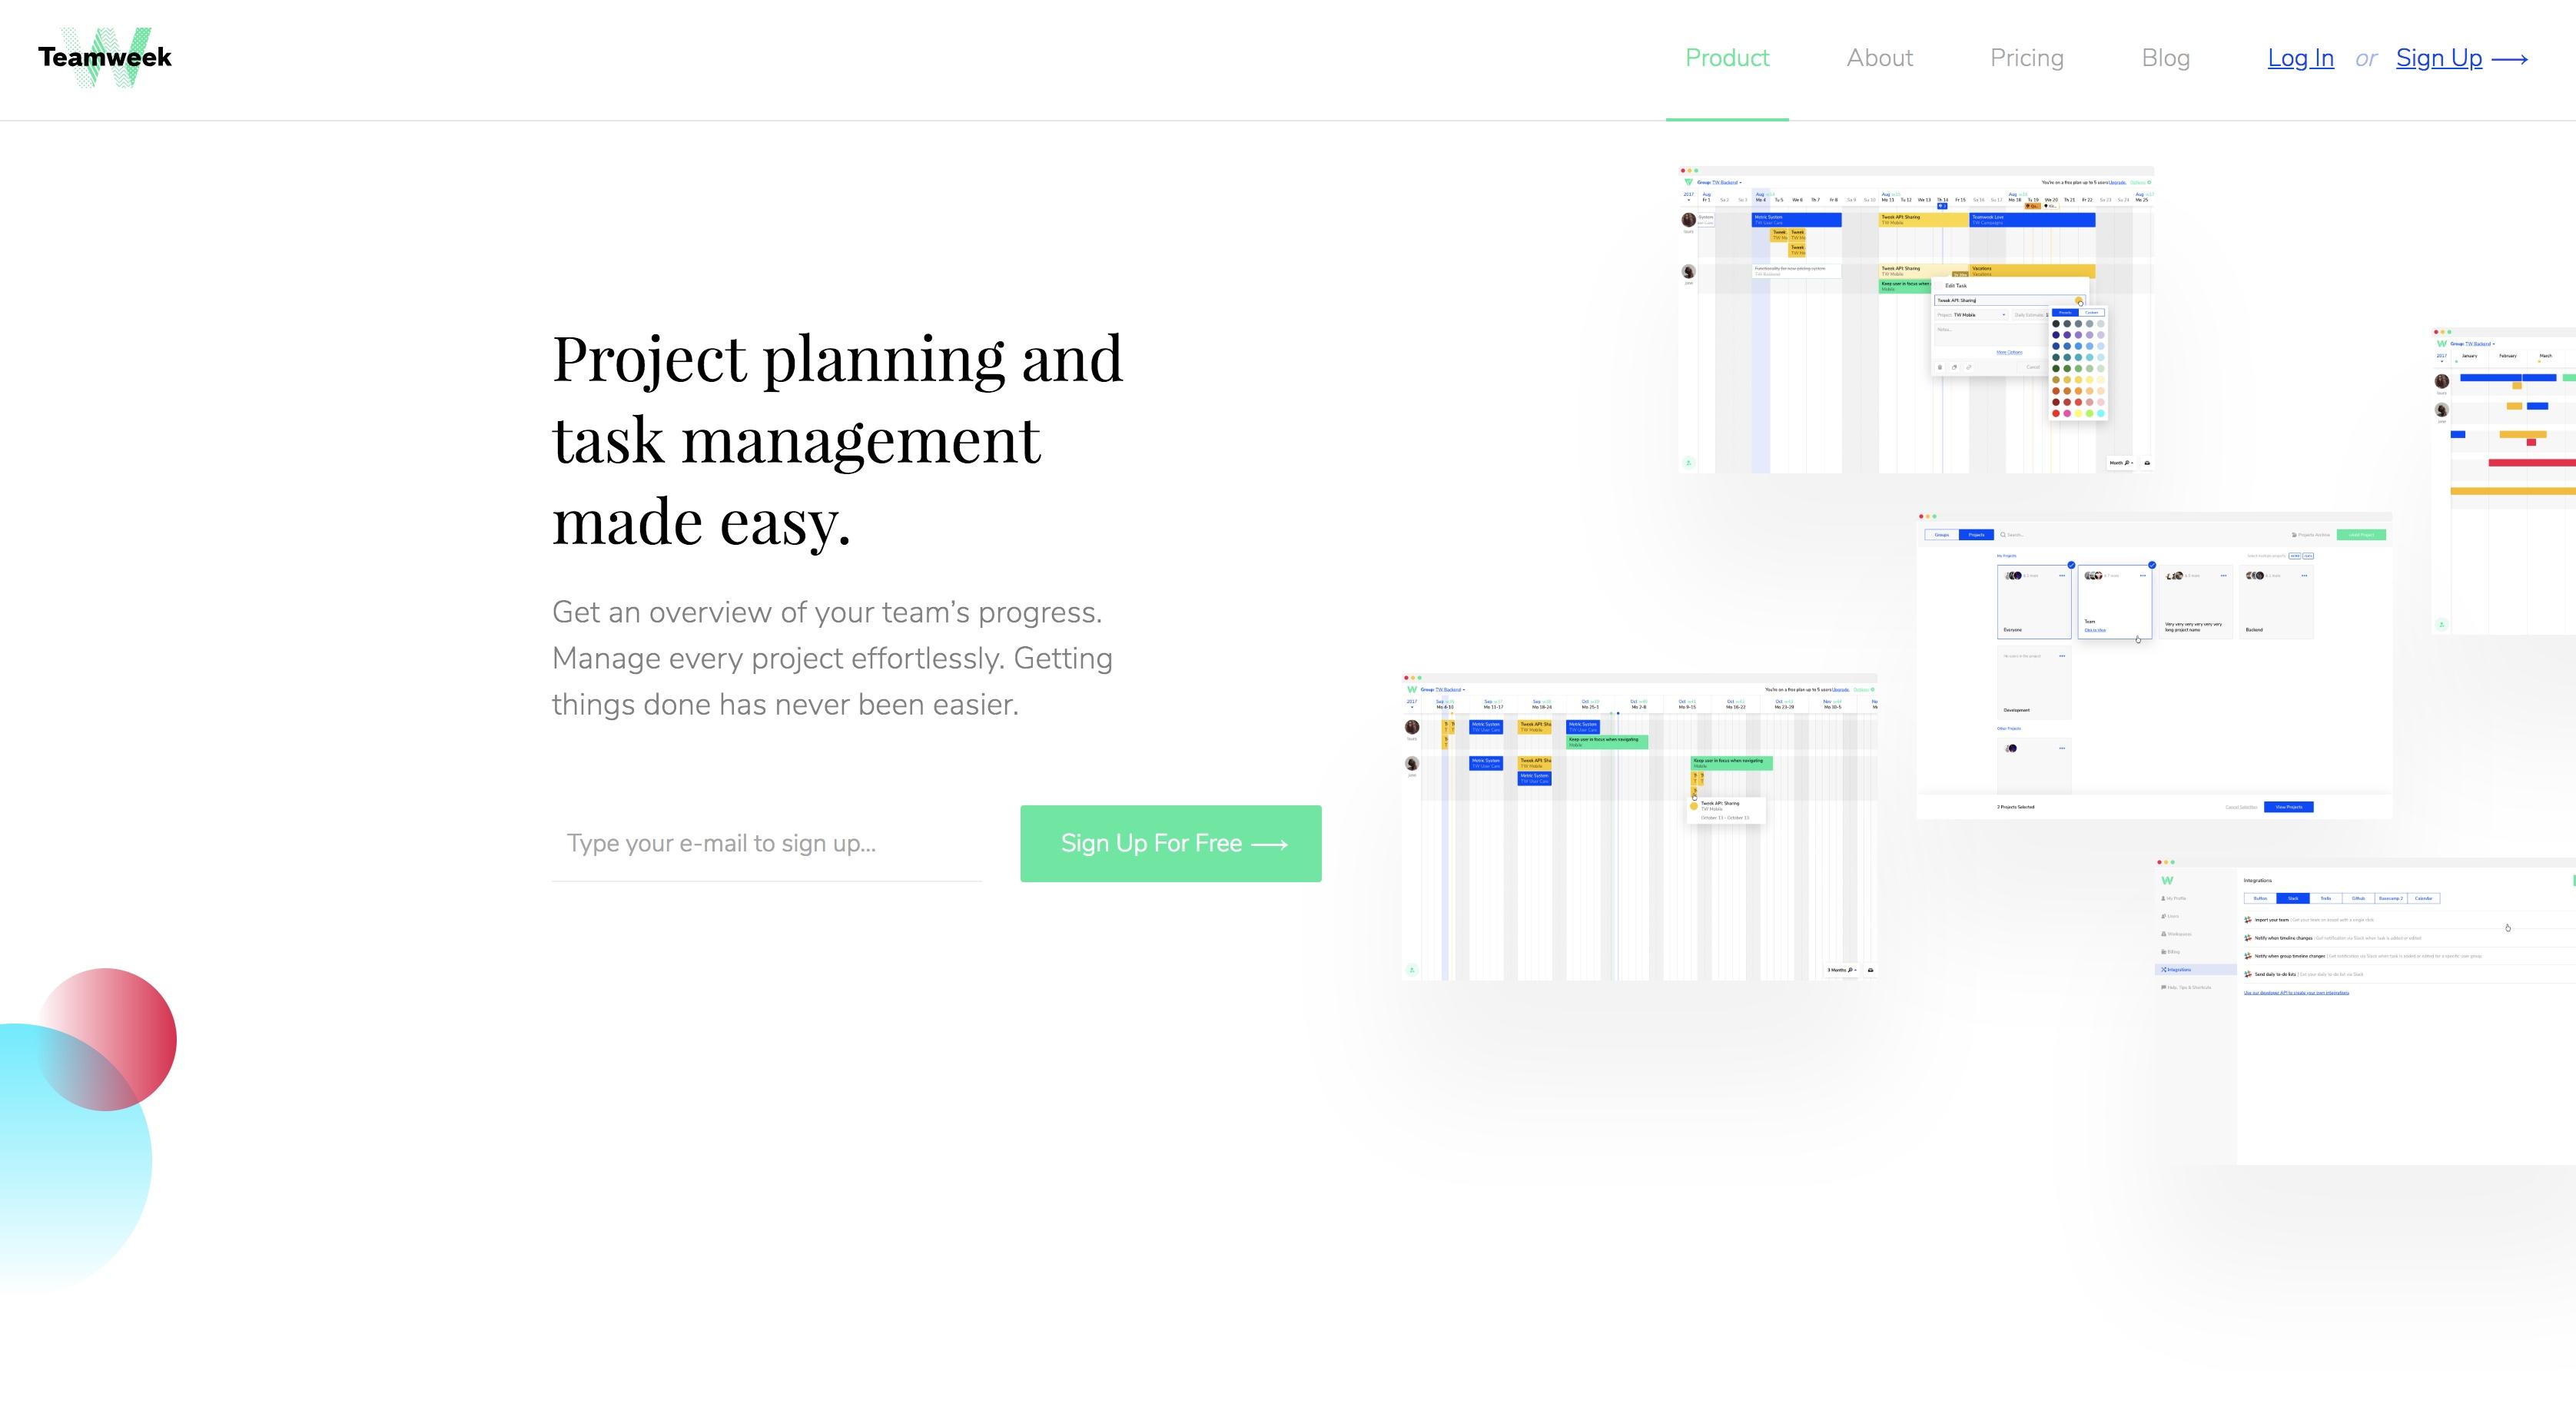 project management apps Teamweek